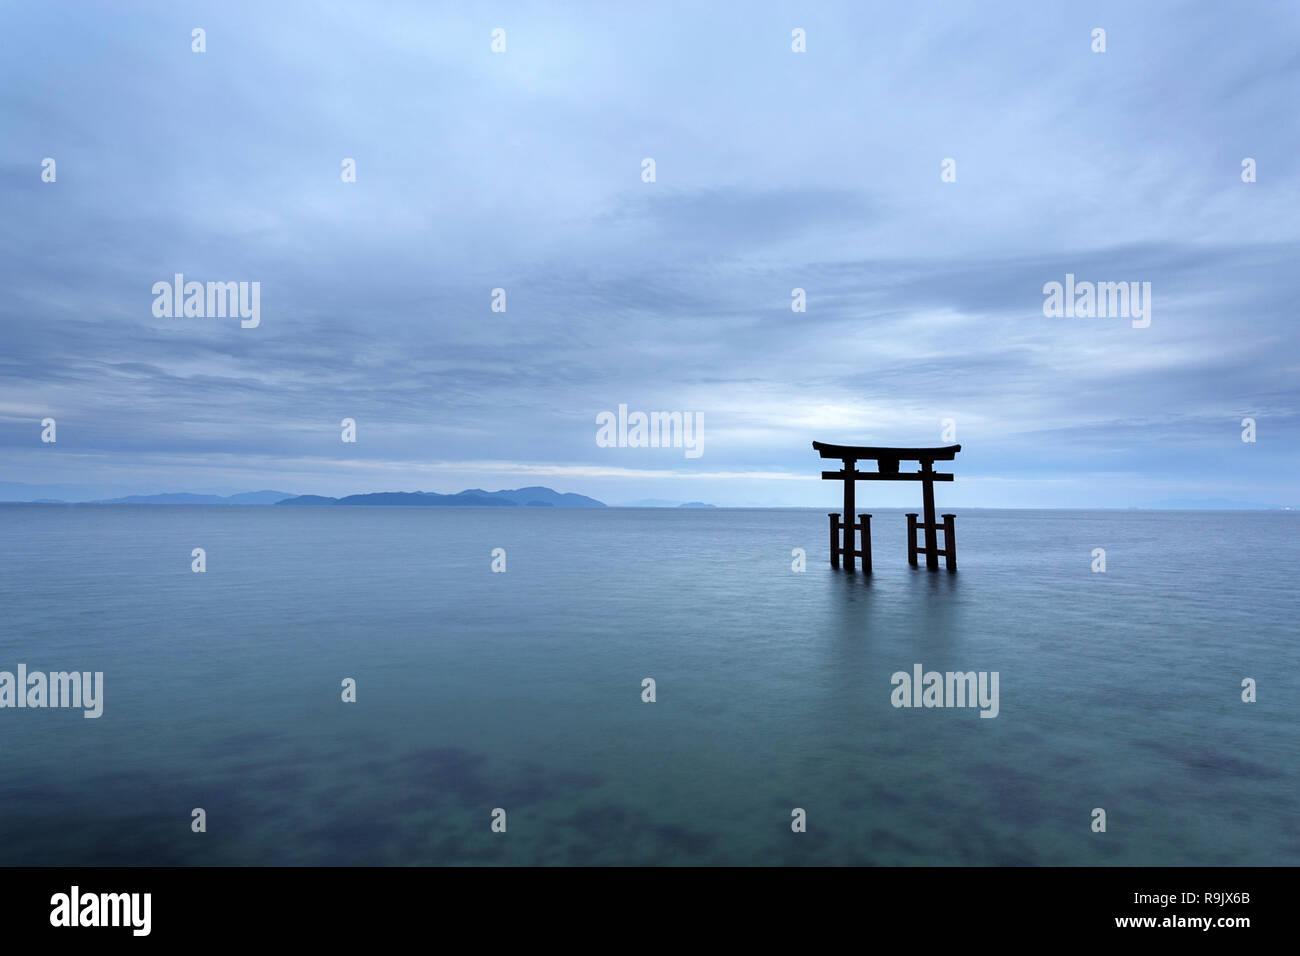 Shirahige Jinja Torii on water, lake Biwa near Kyoto, Japan Stock Photo